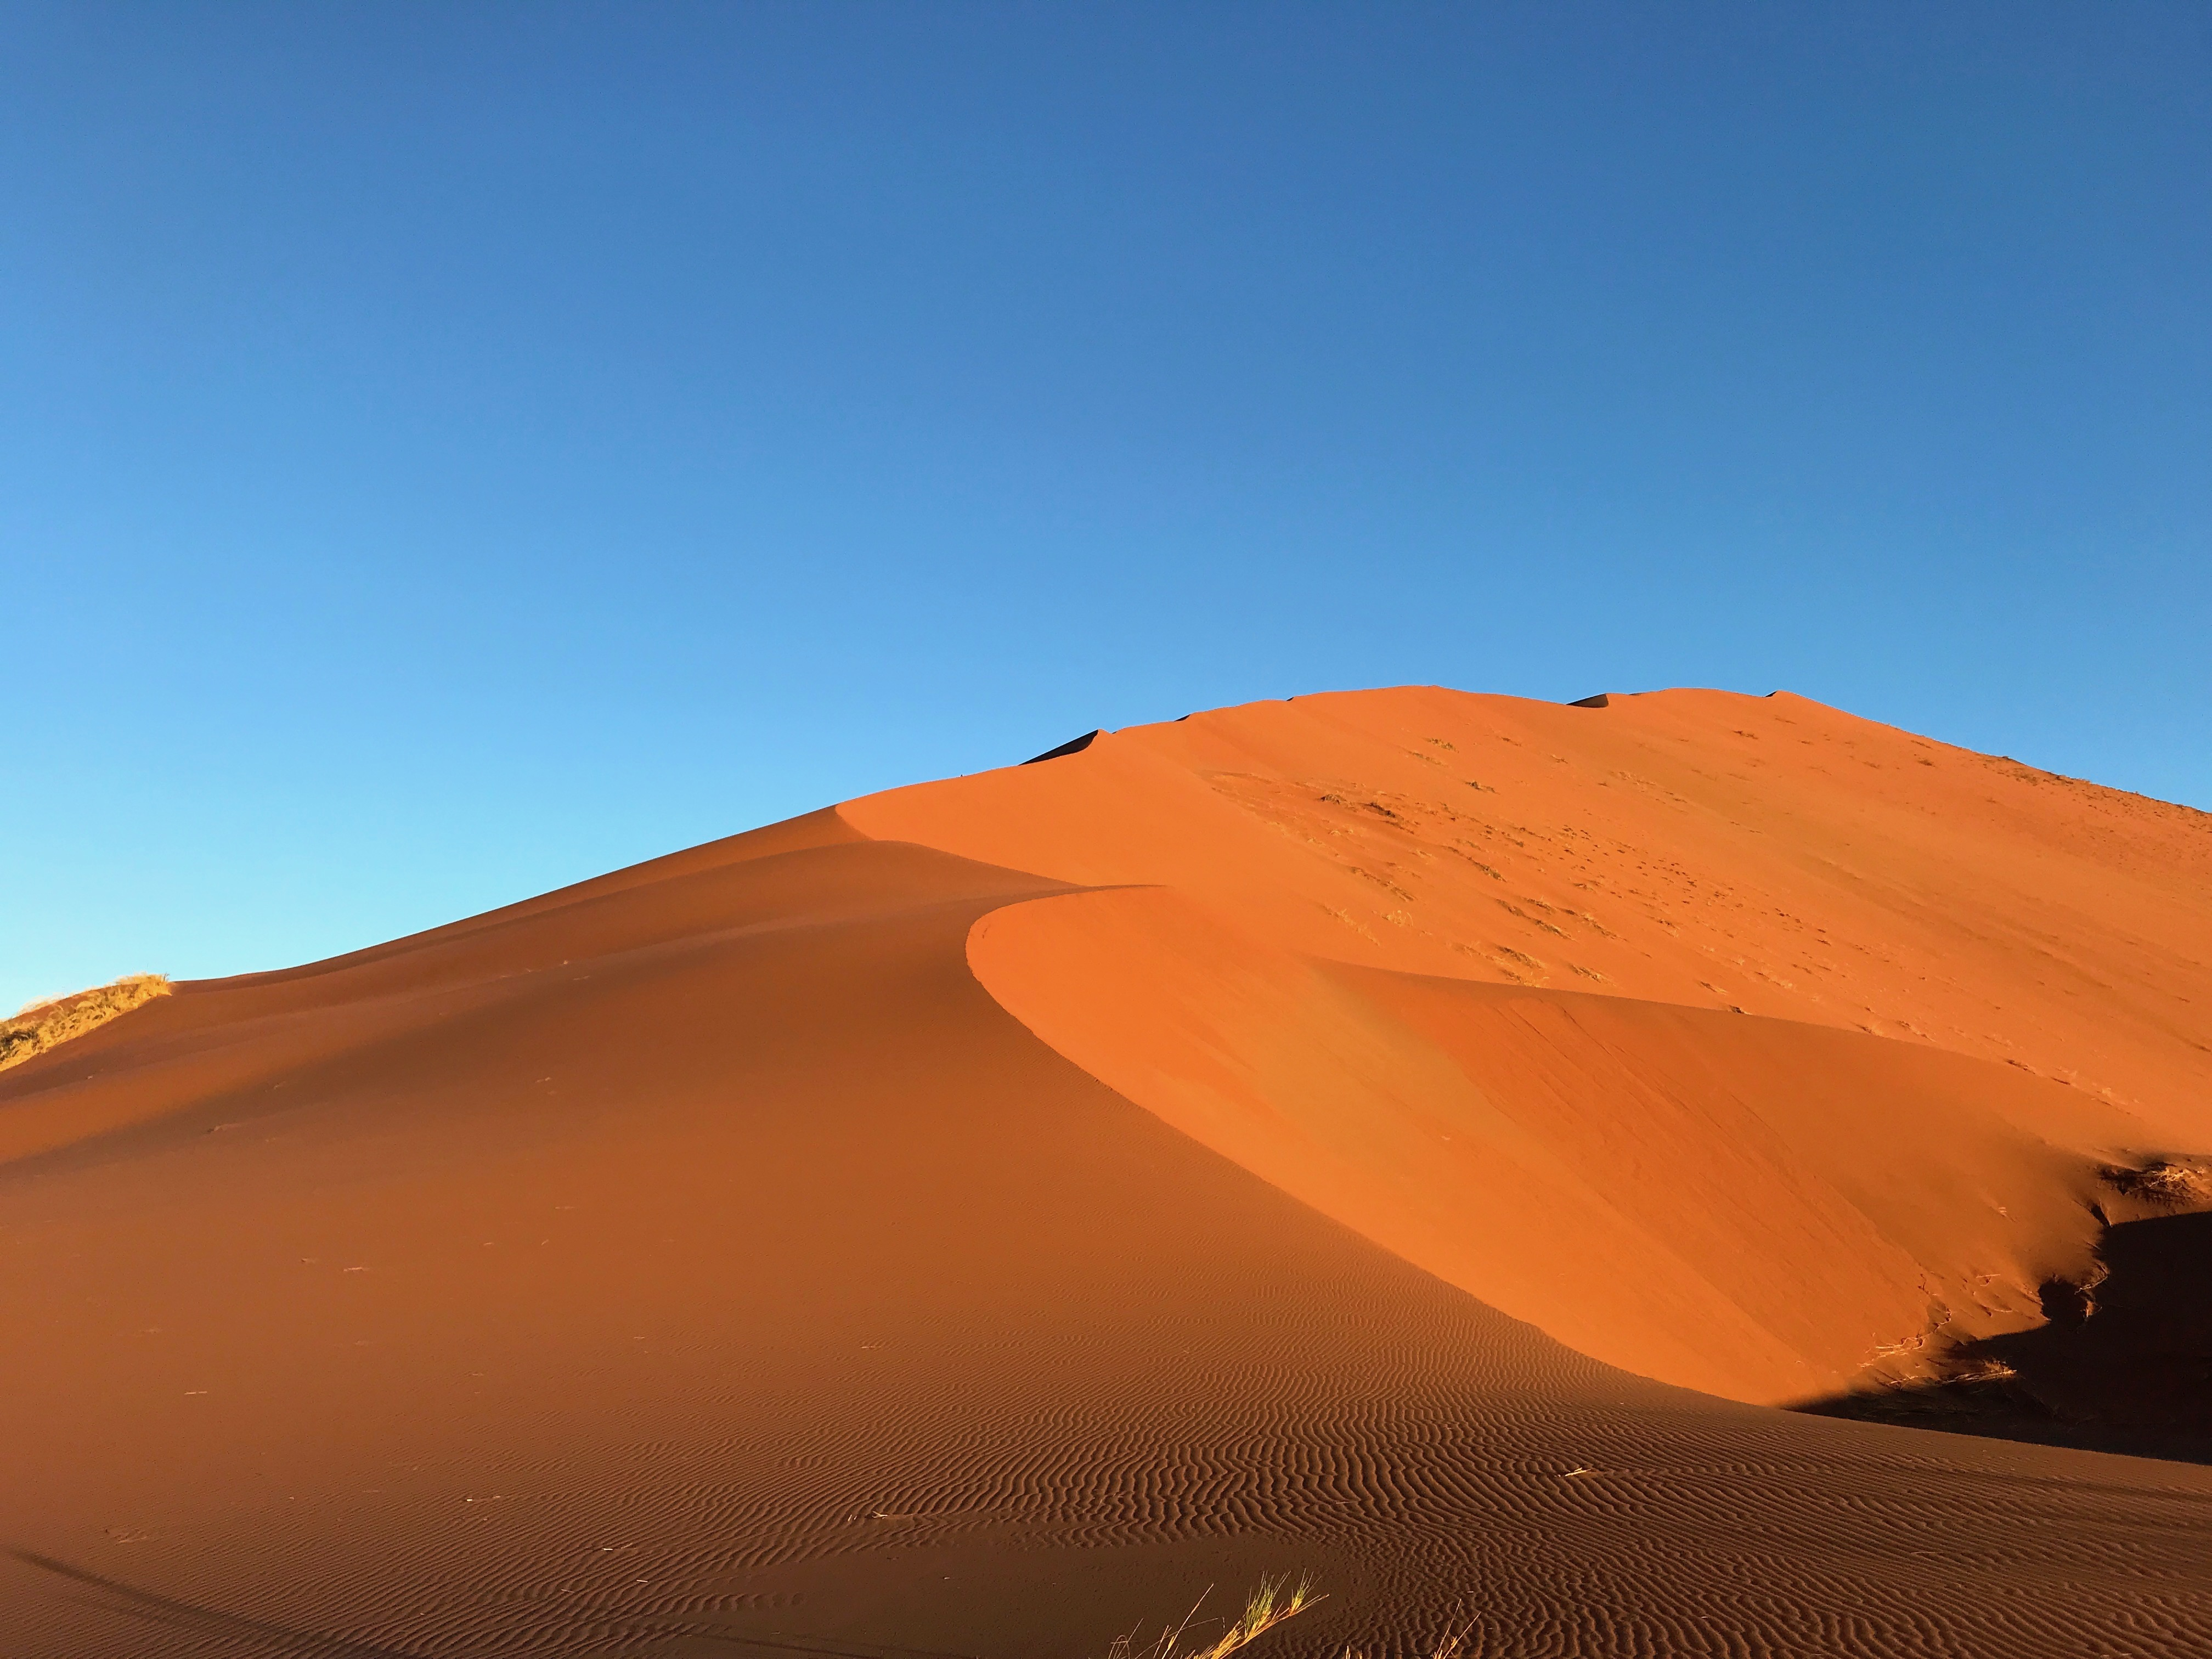 namib-desert-namibia-dunes-lustforthesublime